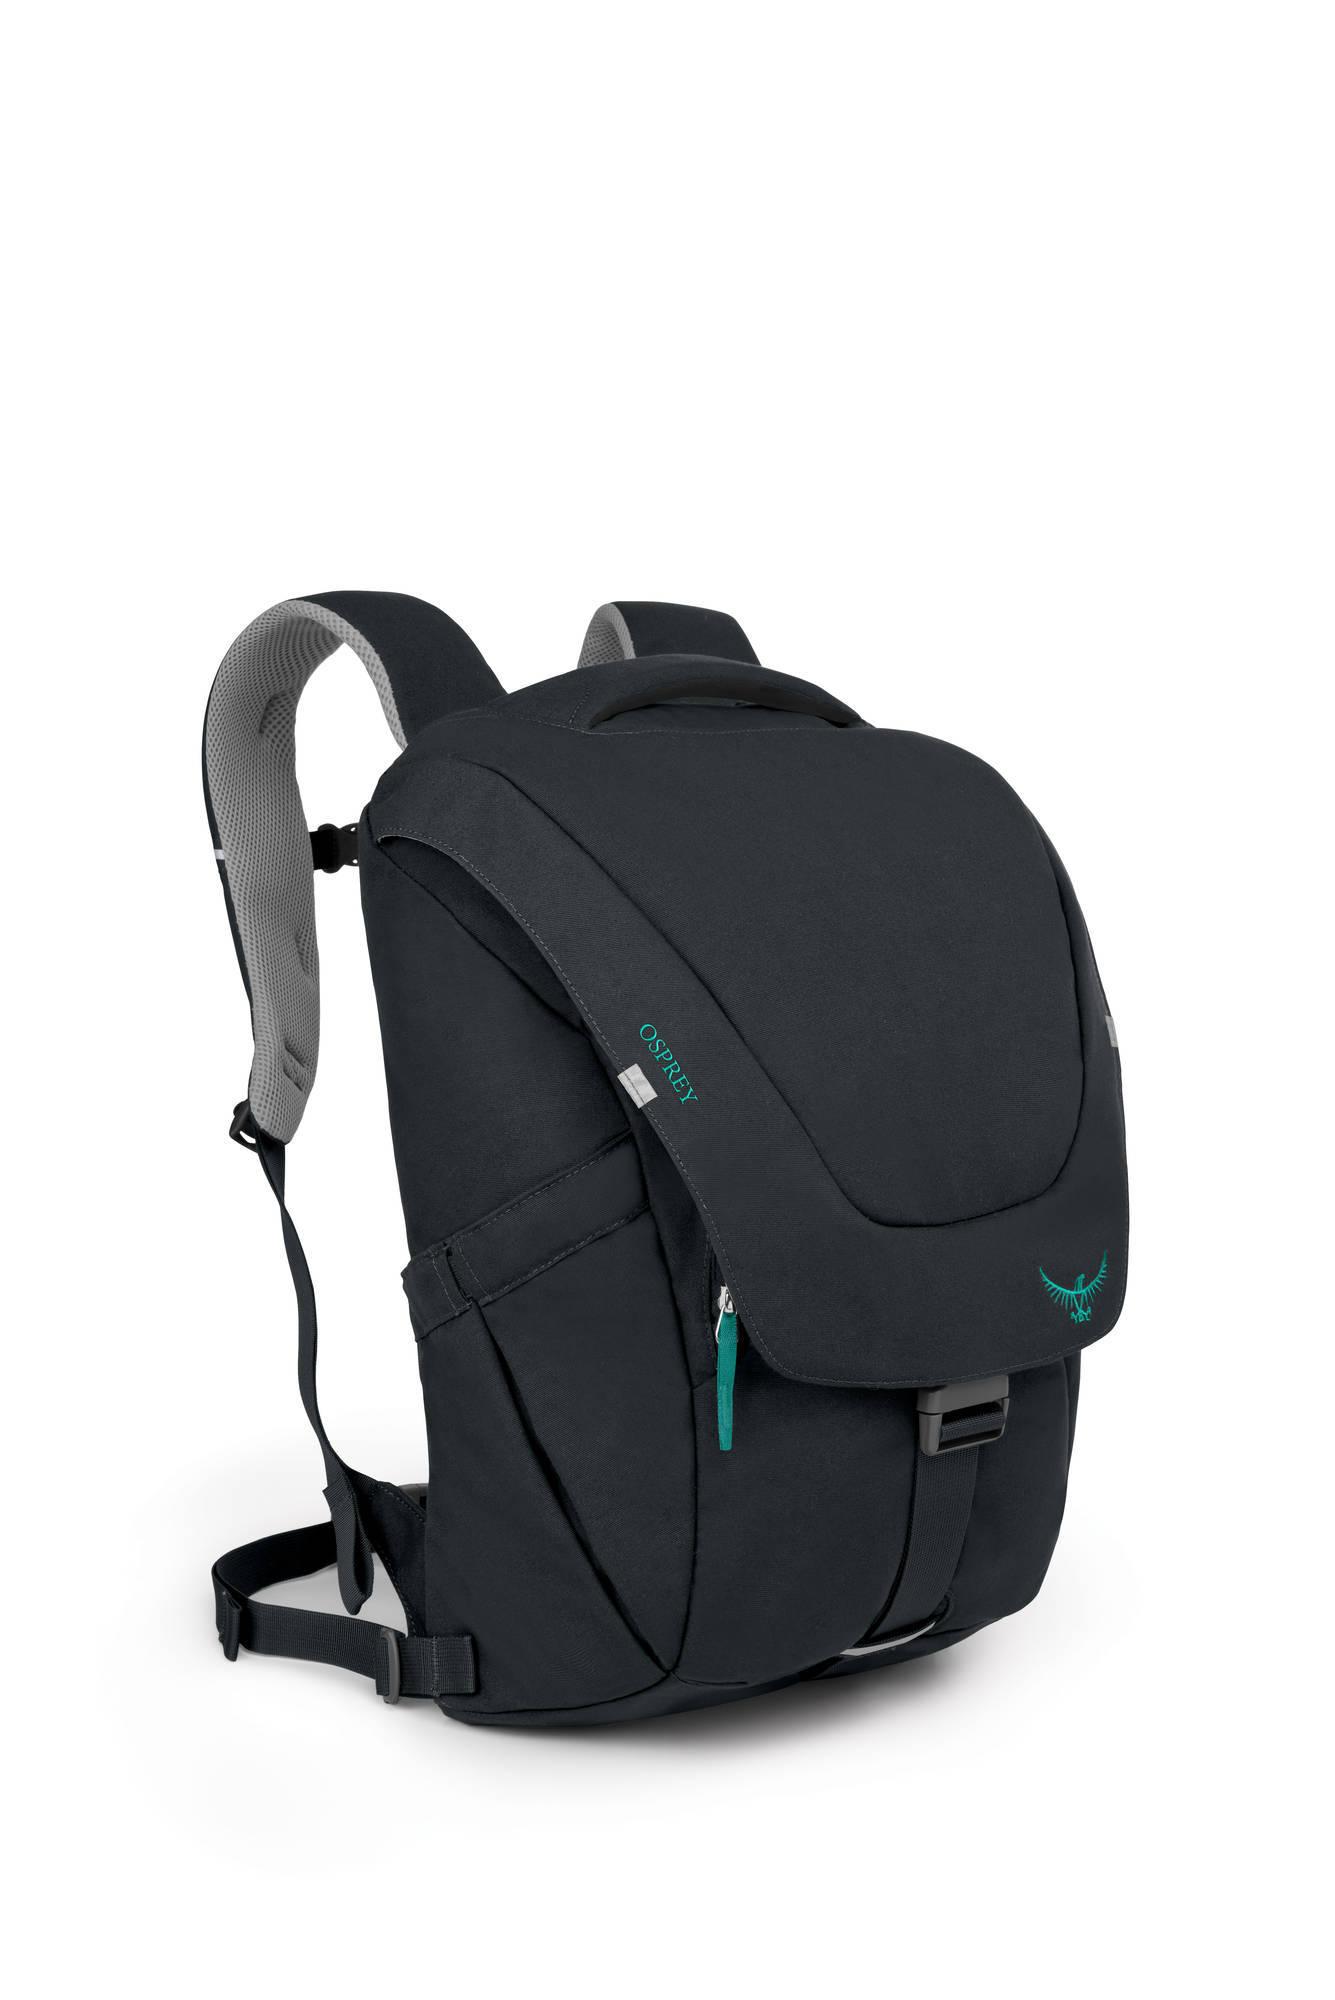 Городские рюкзаки Рюкзак женский Osprey Flap Jill Pack Flap_Jill_Pack_Side_Black_web.jpg